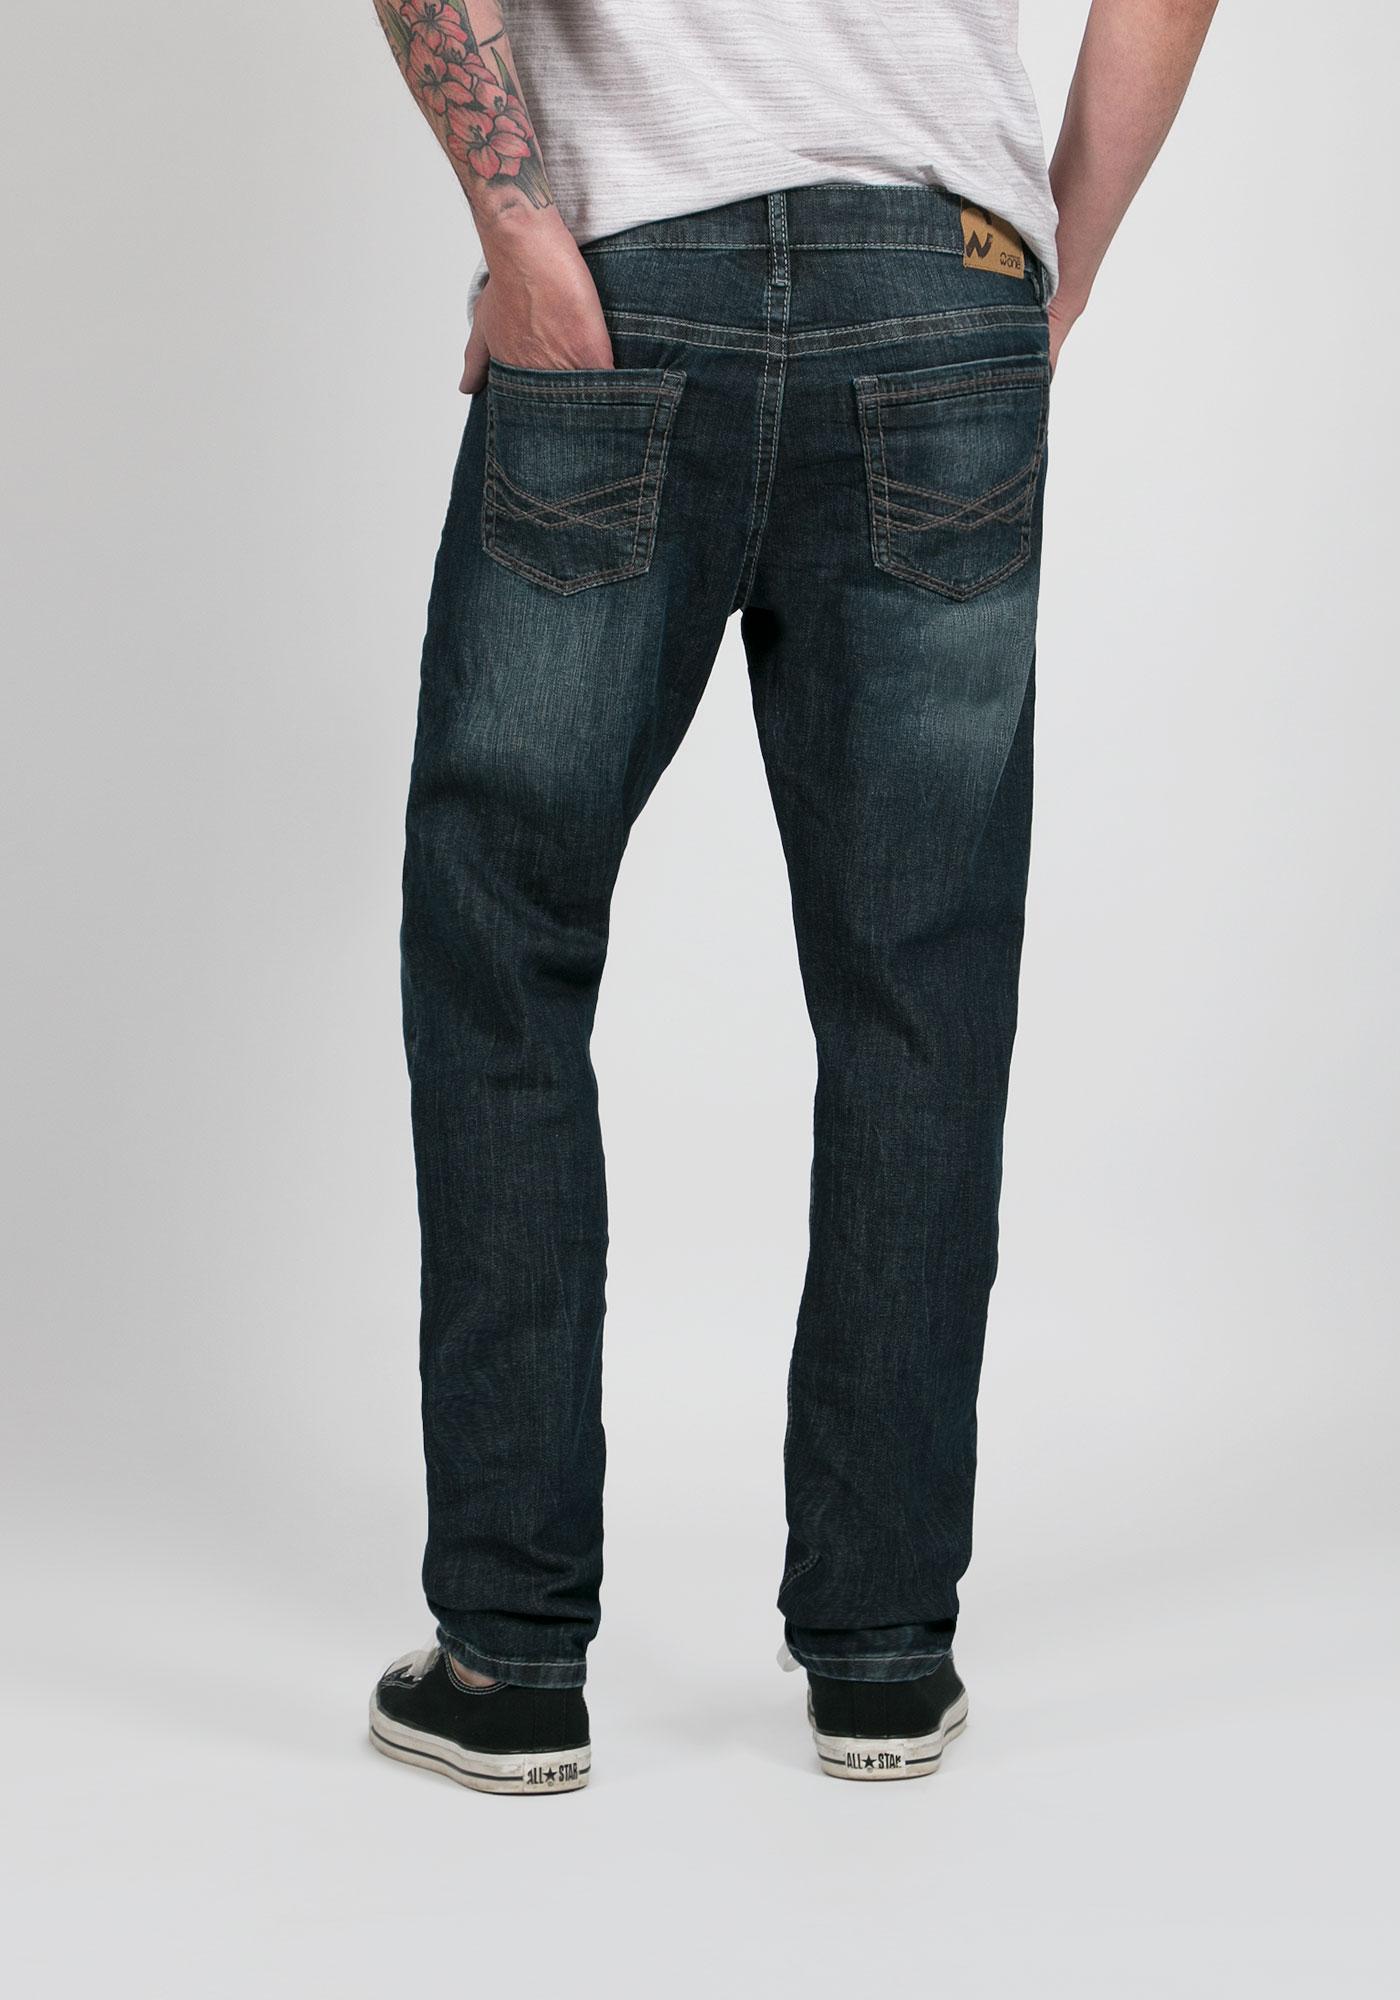 Mens Jeans 38